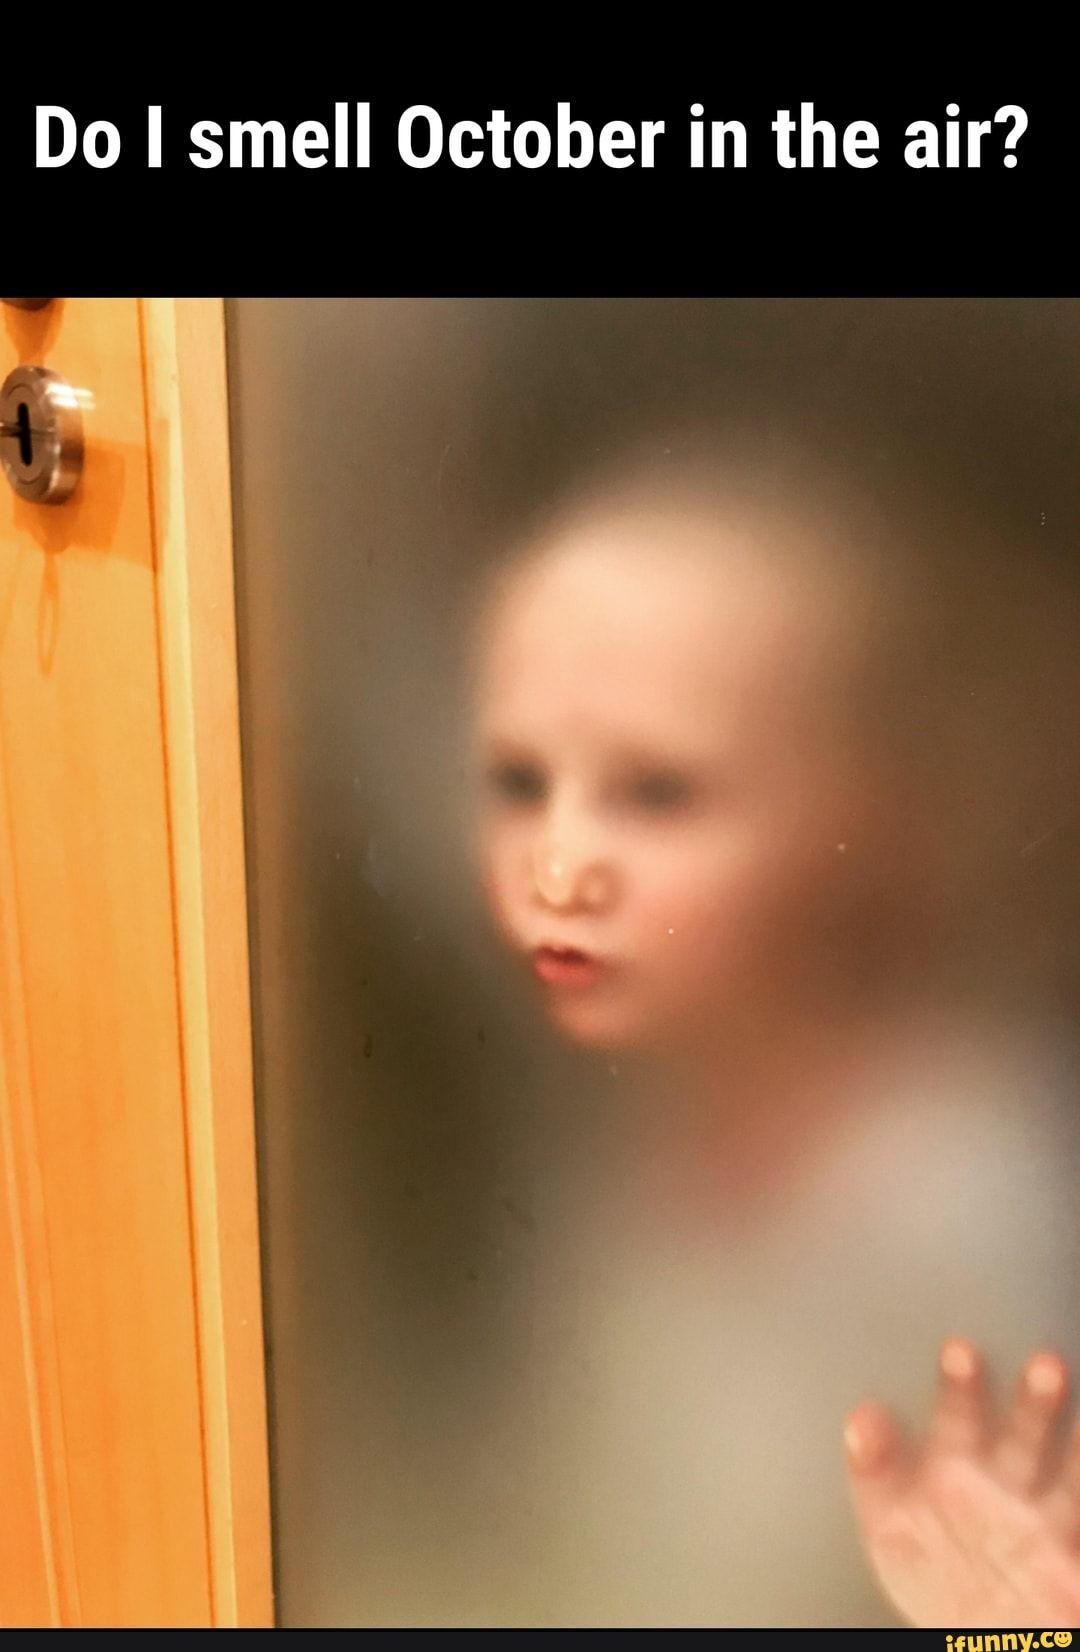 Do I Smell October In The Air Ifunny In 2020 Bathroom Doors Design Fails Bathroom Humor